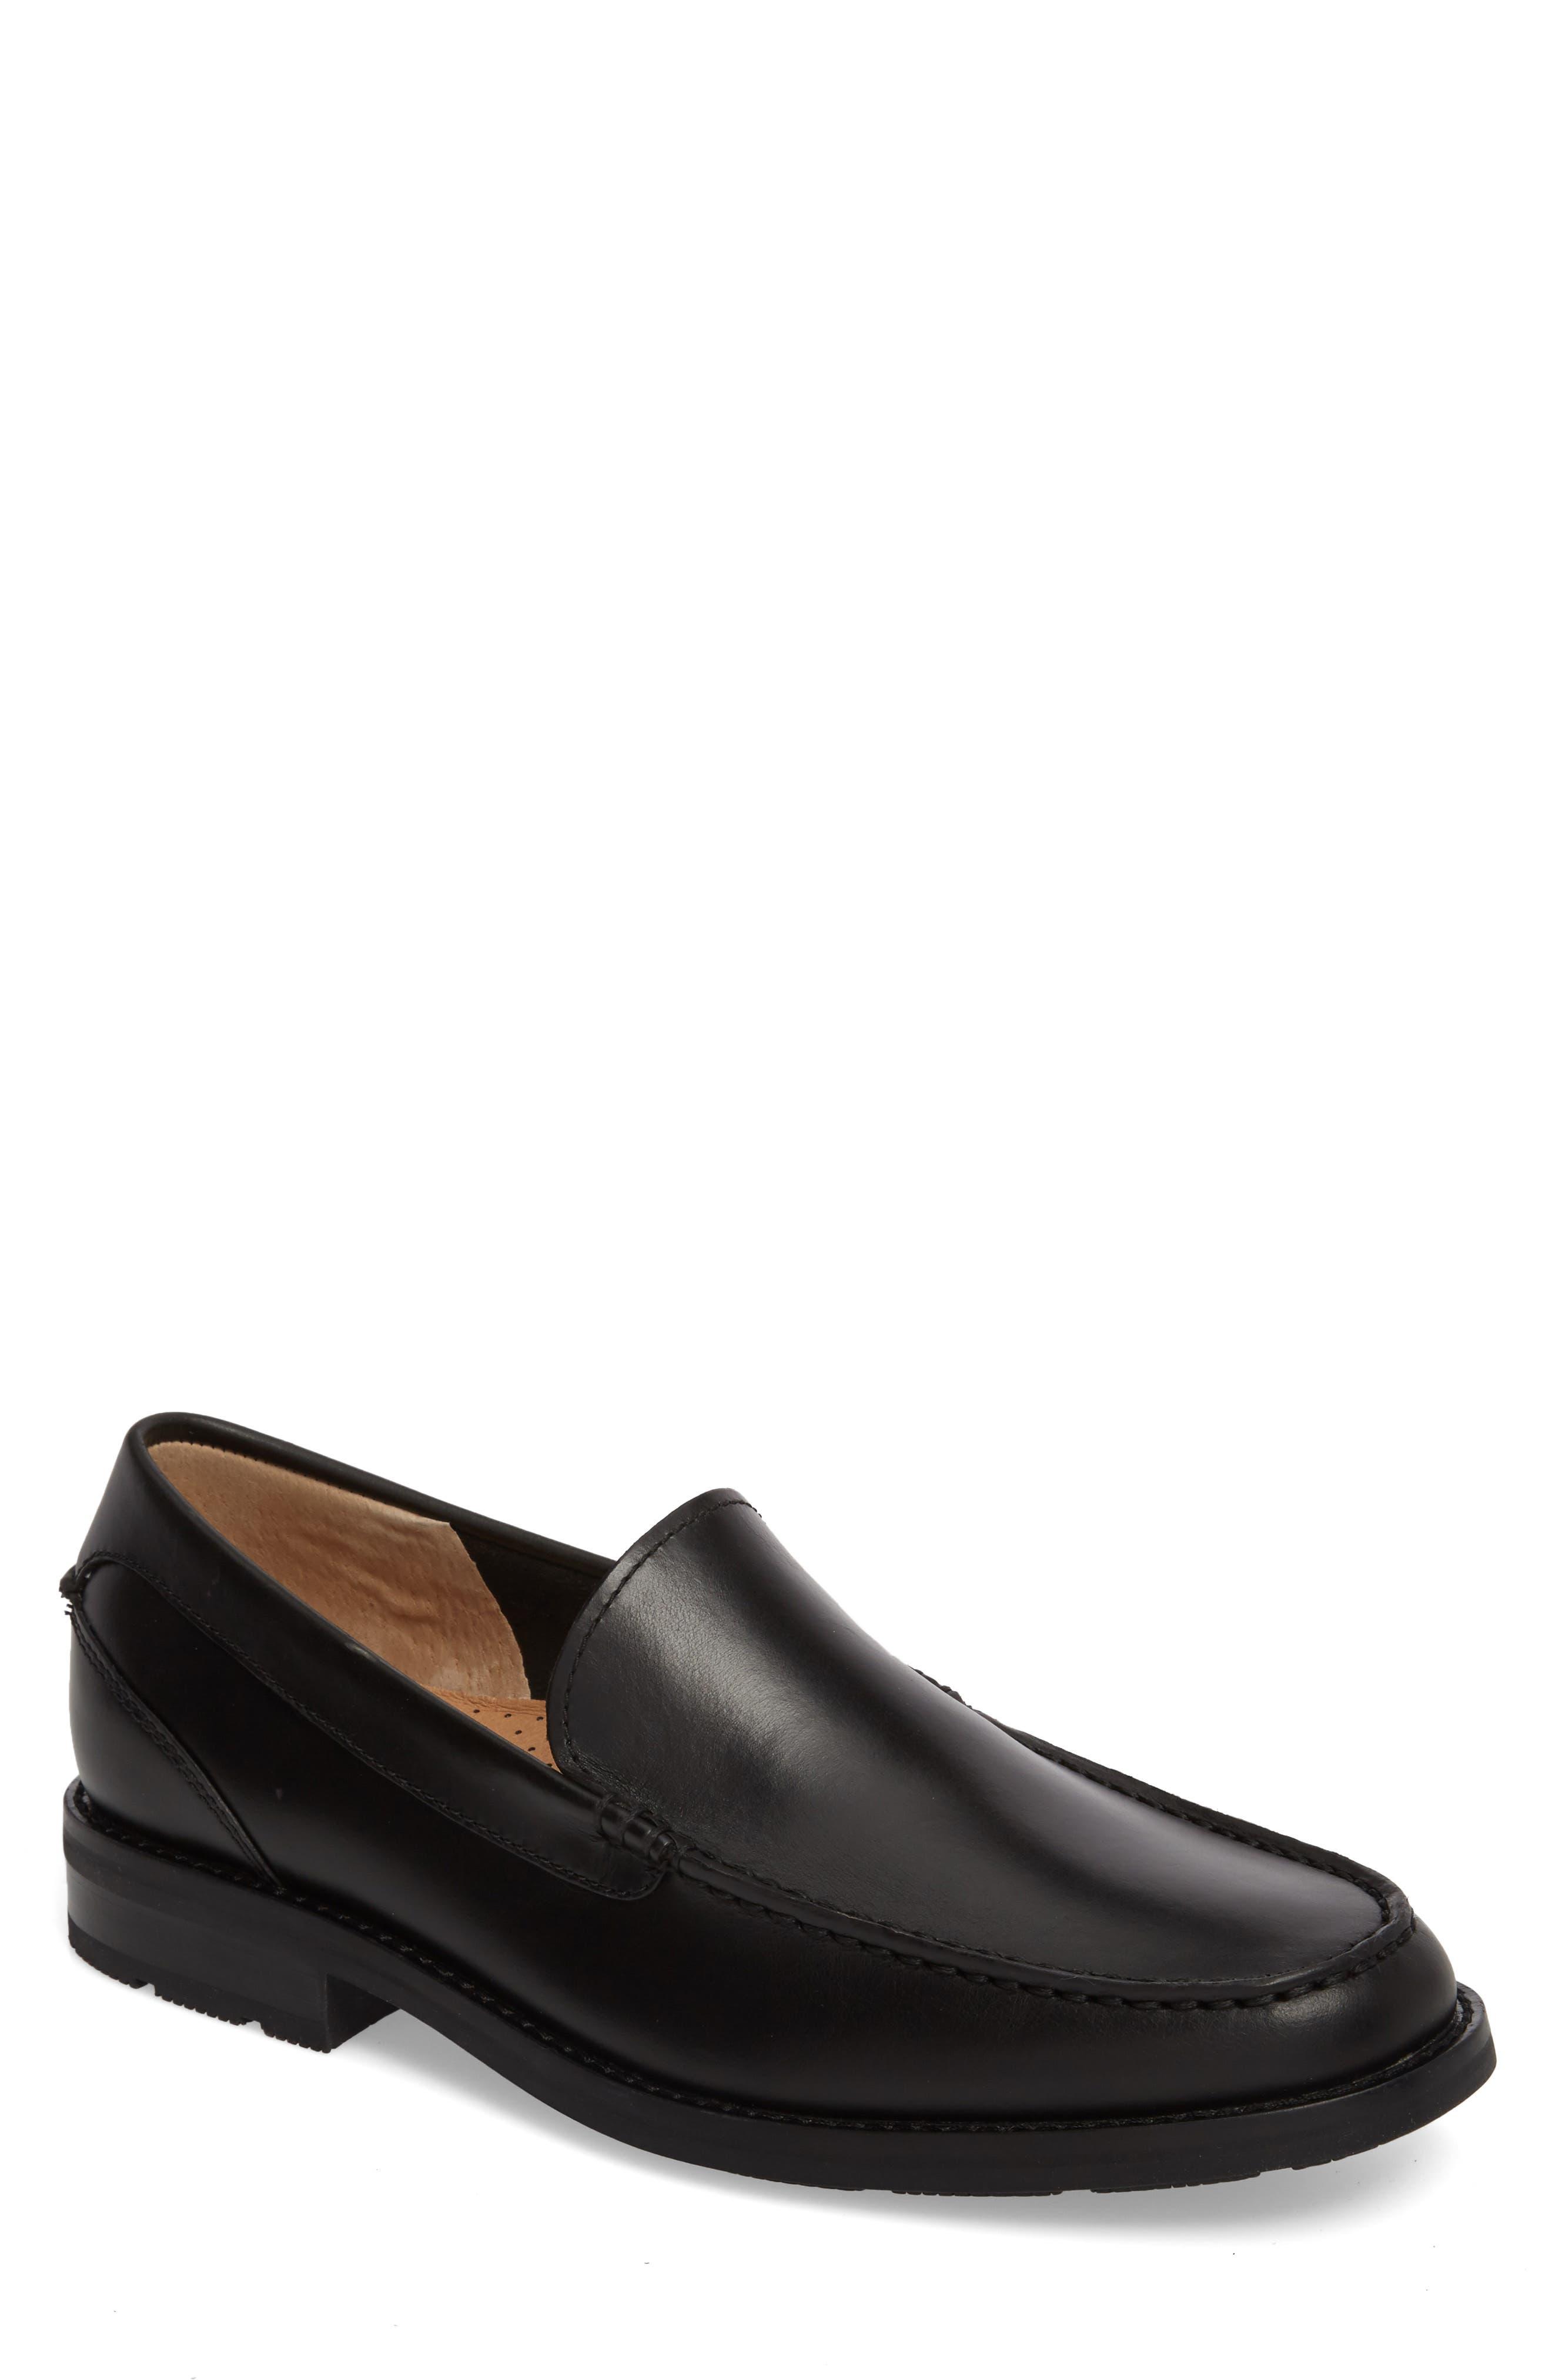 Sperry Essex Venetian Loafer (Men)